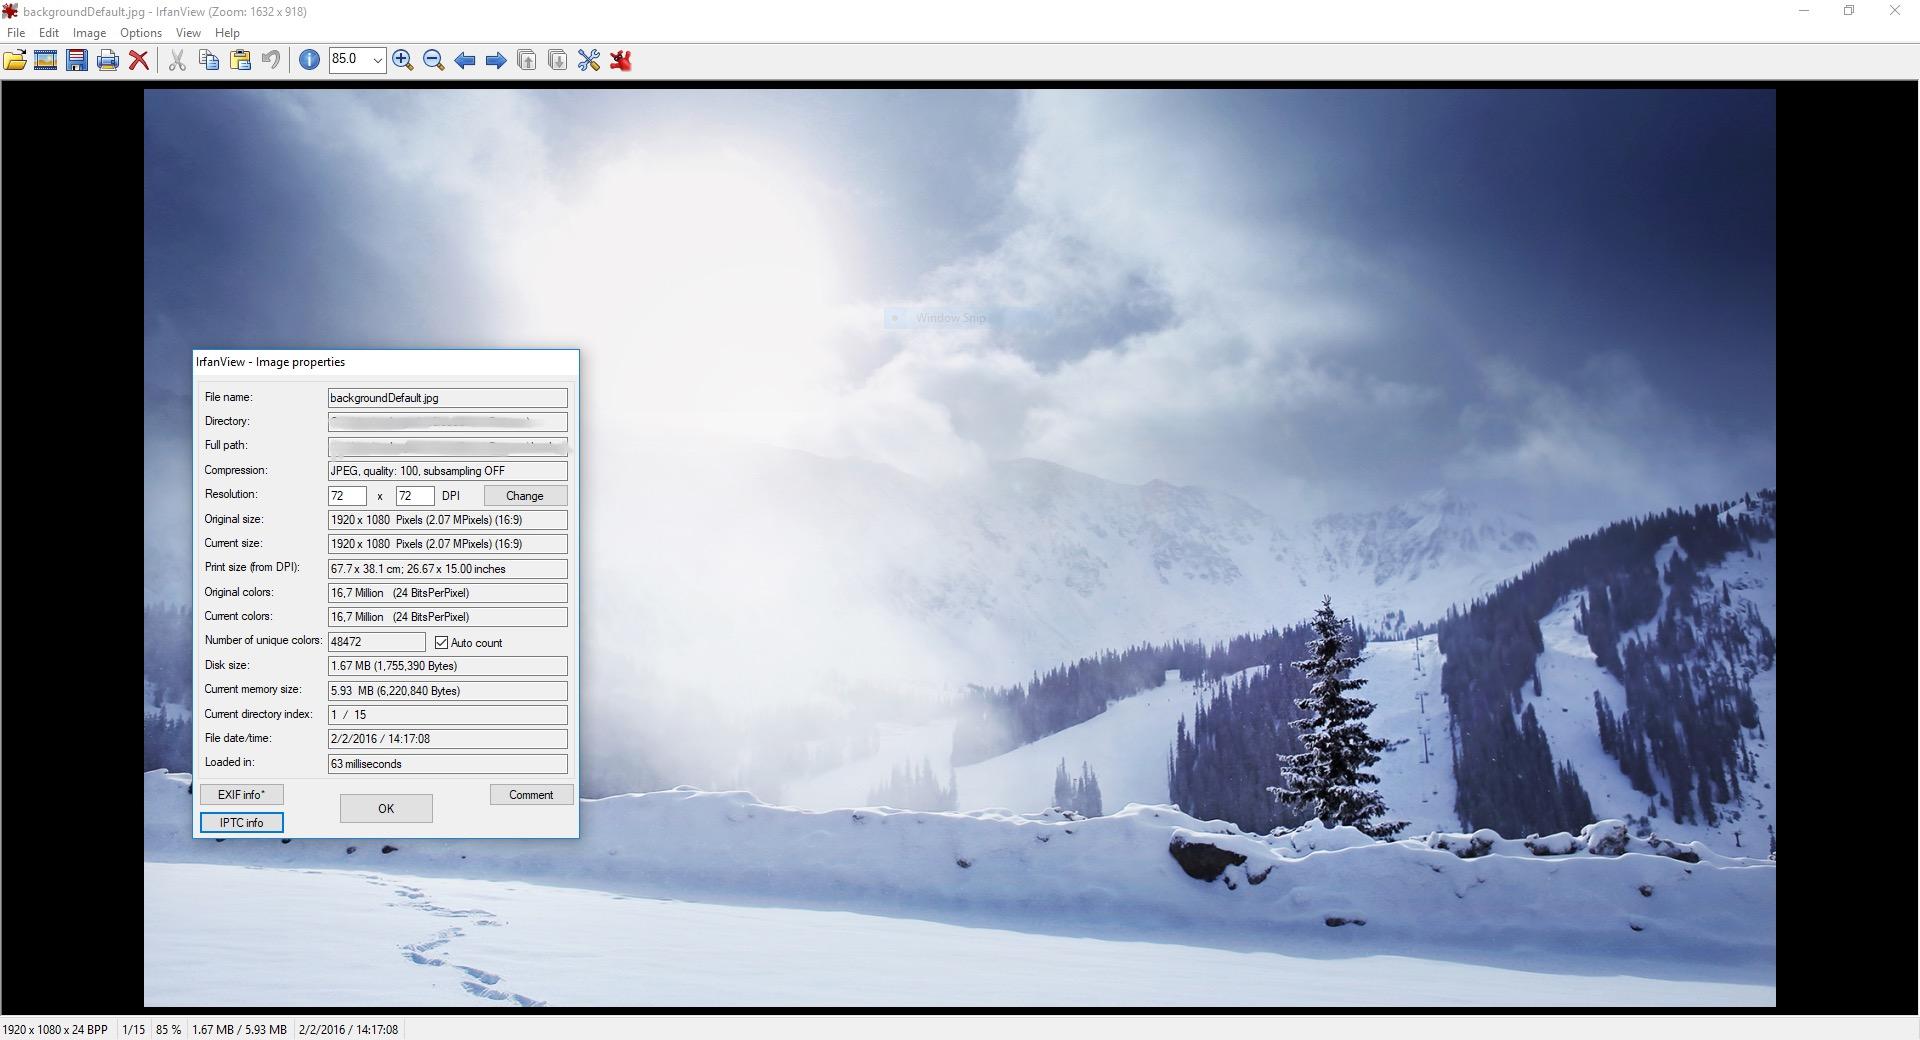 wallpaper hp,sky,snow,geological phenomenon,graphics software,winter